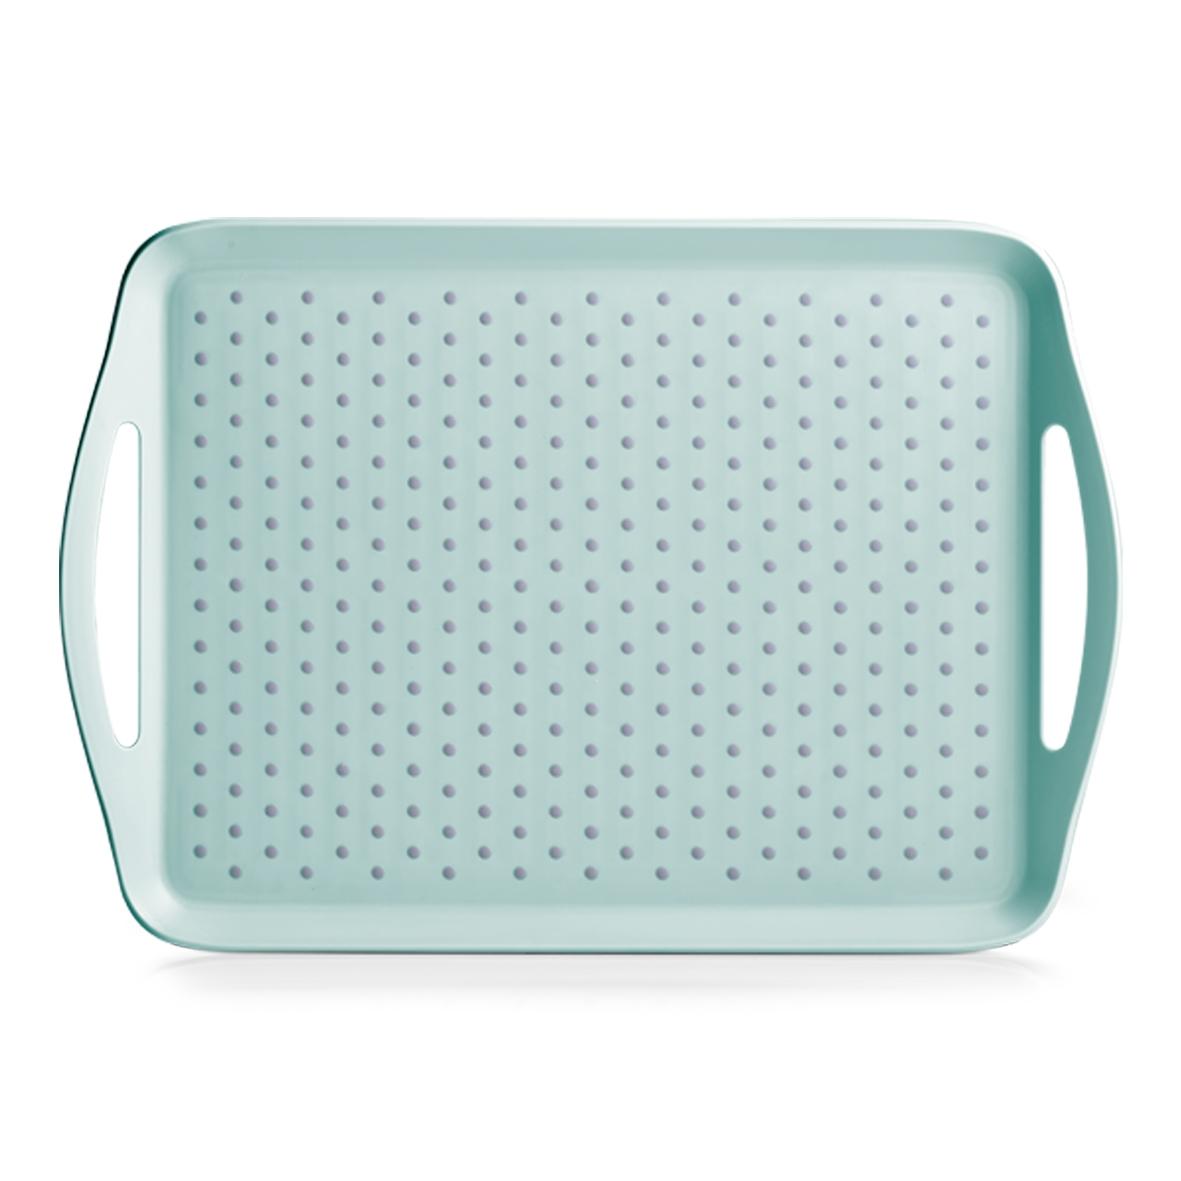 Tava pentru servire Anti-Slip, Plastic, l45,5xA32xH4,5 cm-Verde Mint imagine